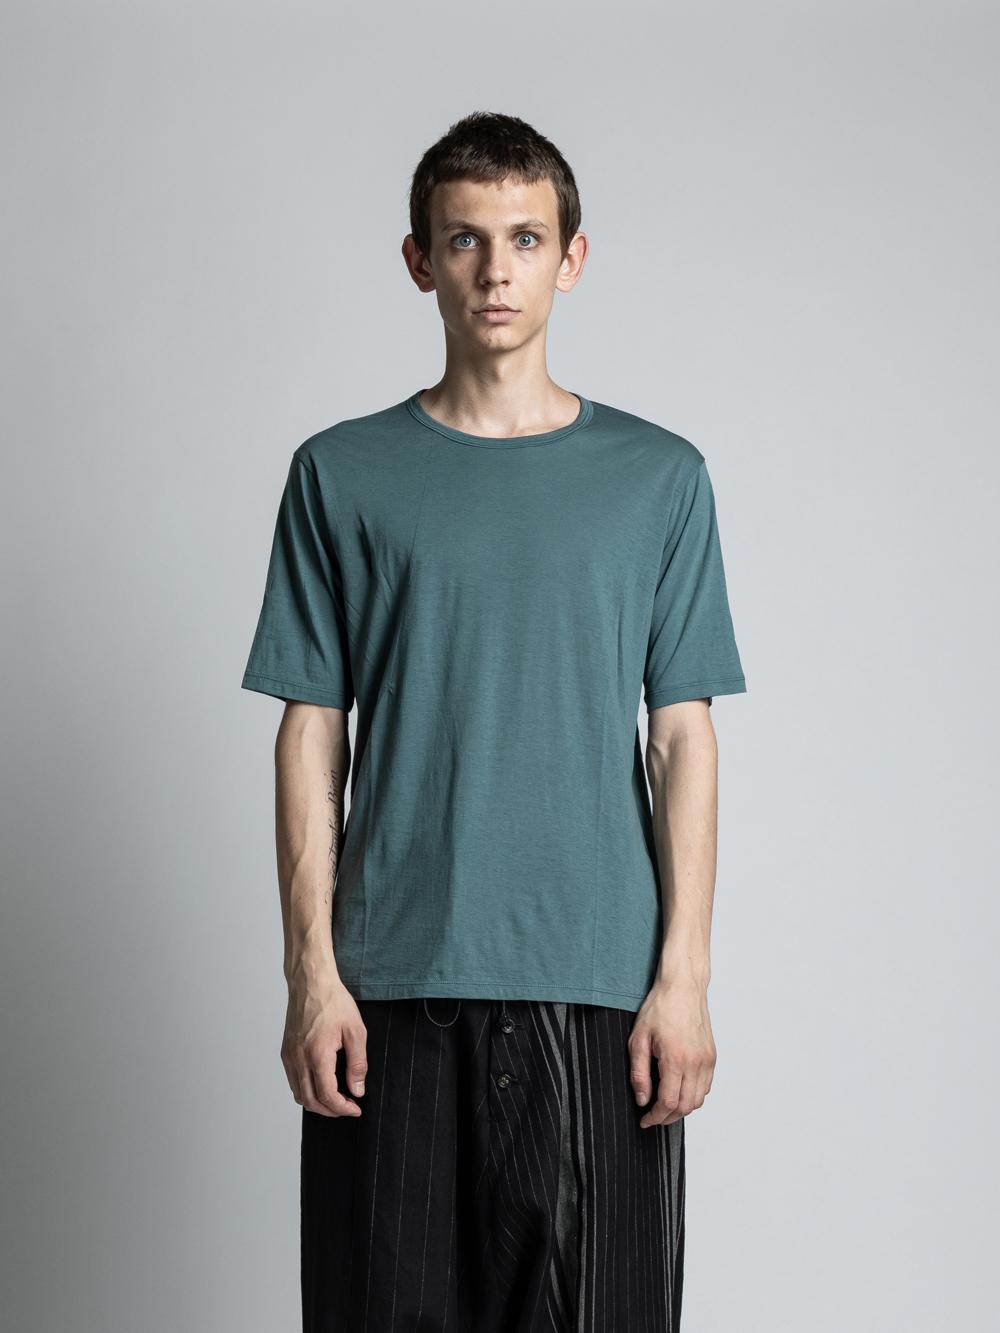 VI-3226-01 / コットンカシミア半袖Tシャツ